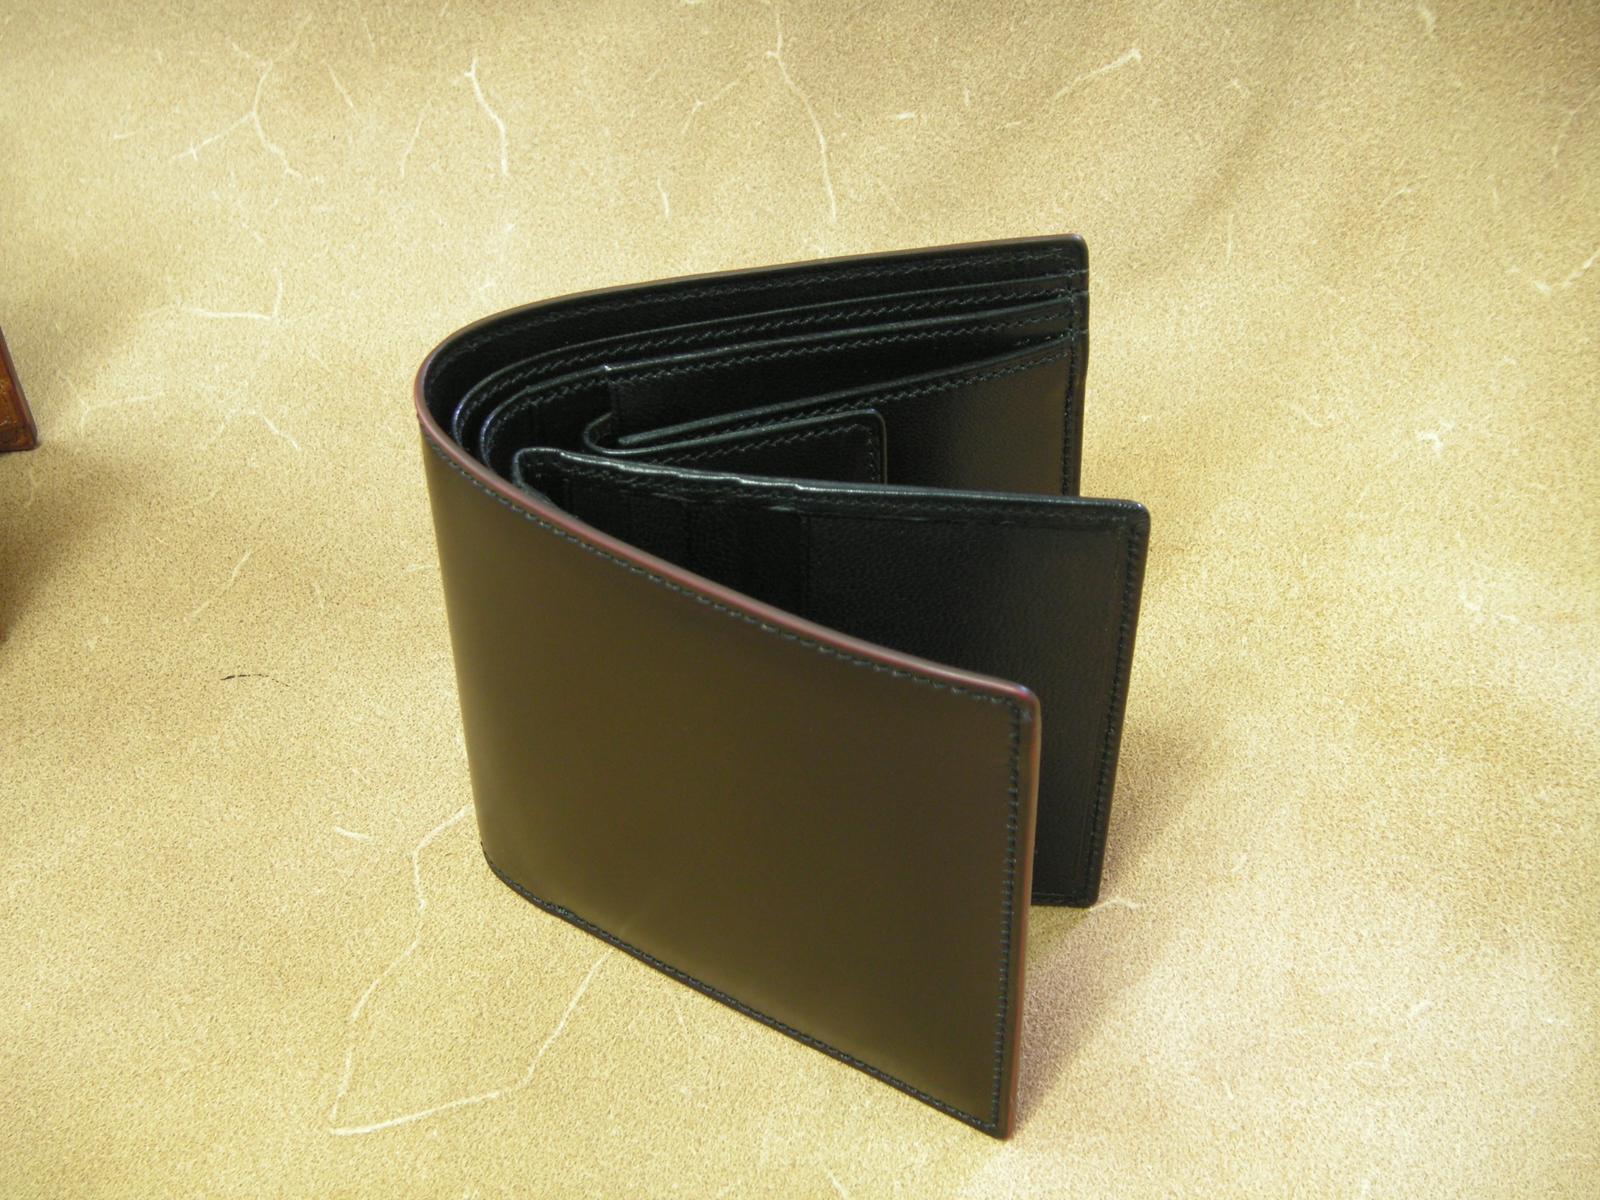 Vincis Gate中ベラ付財布(コ-ドバン:ブラック)